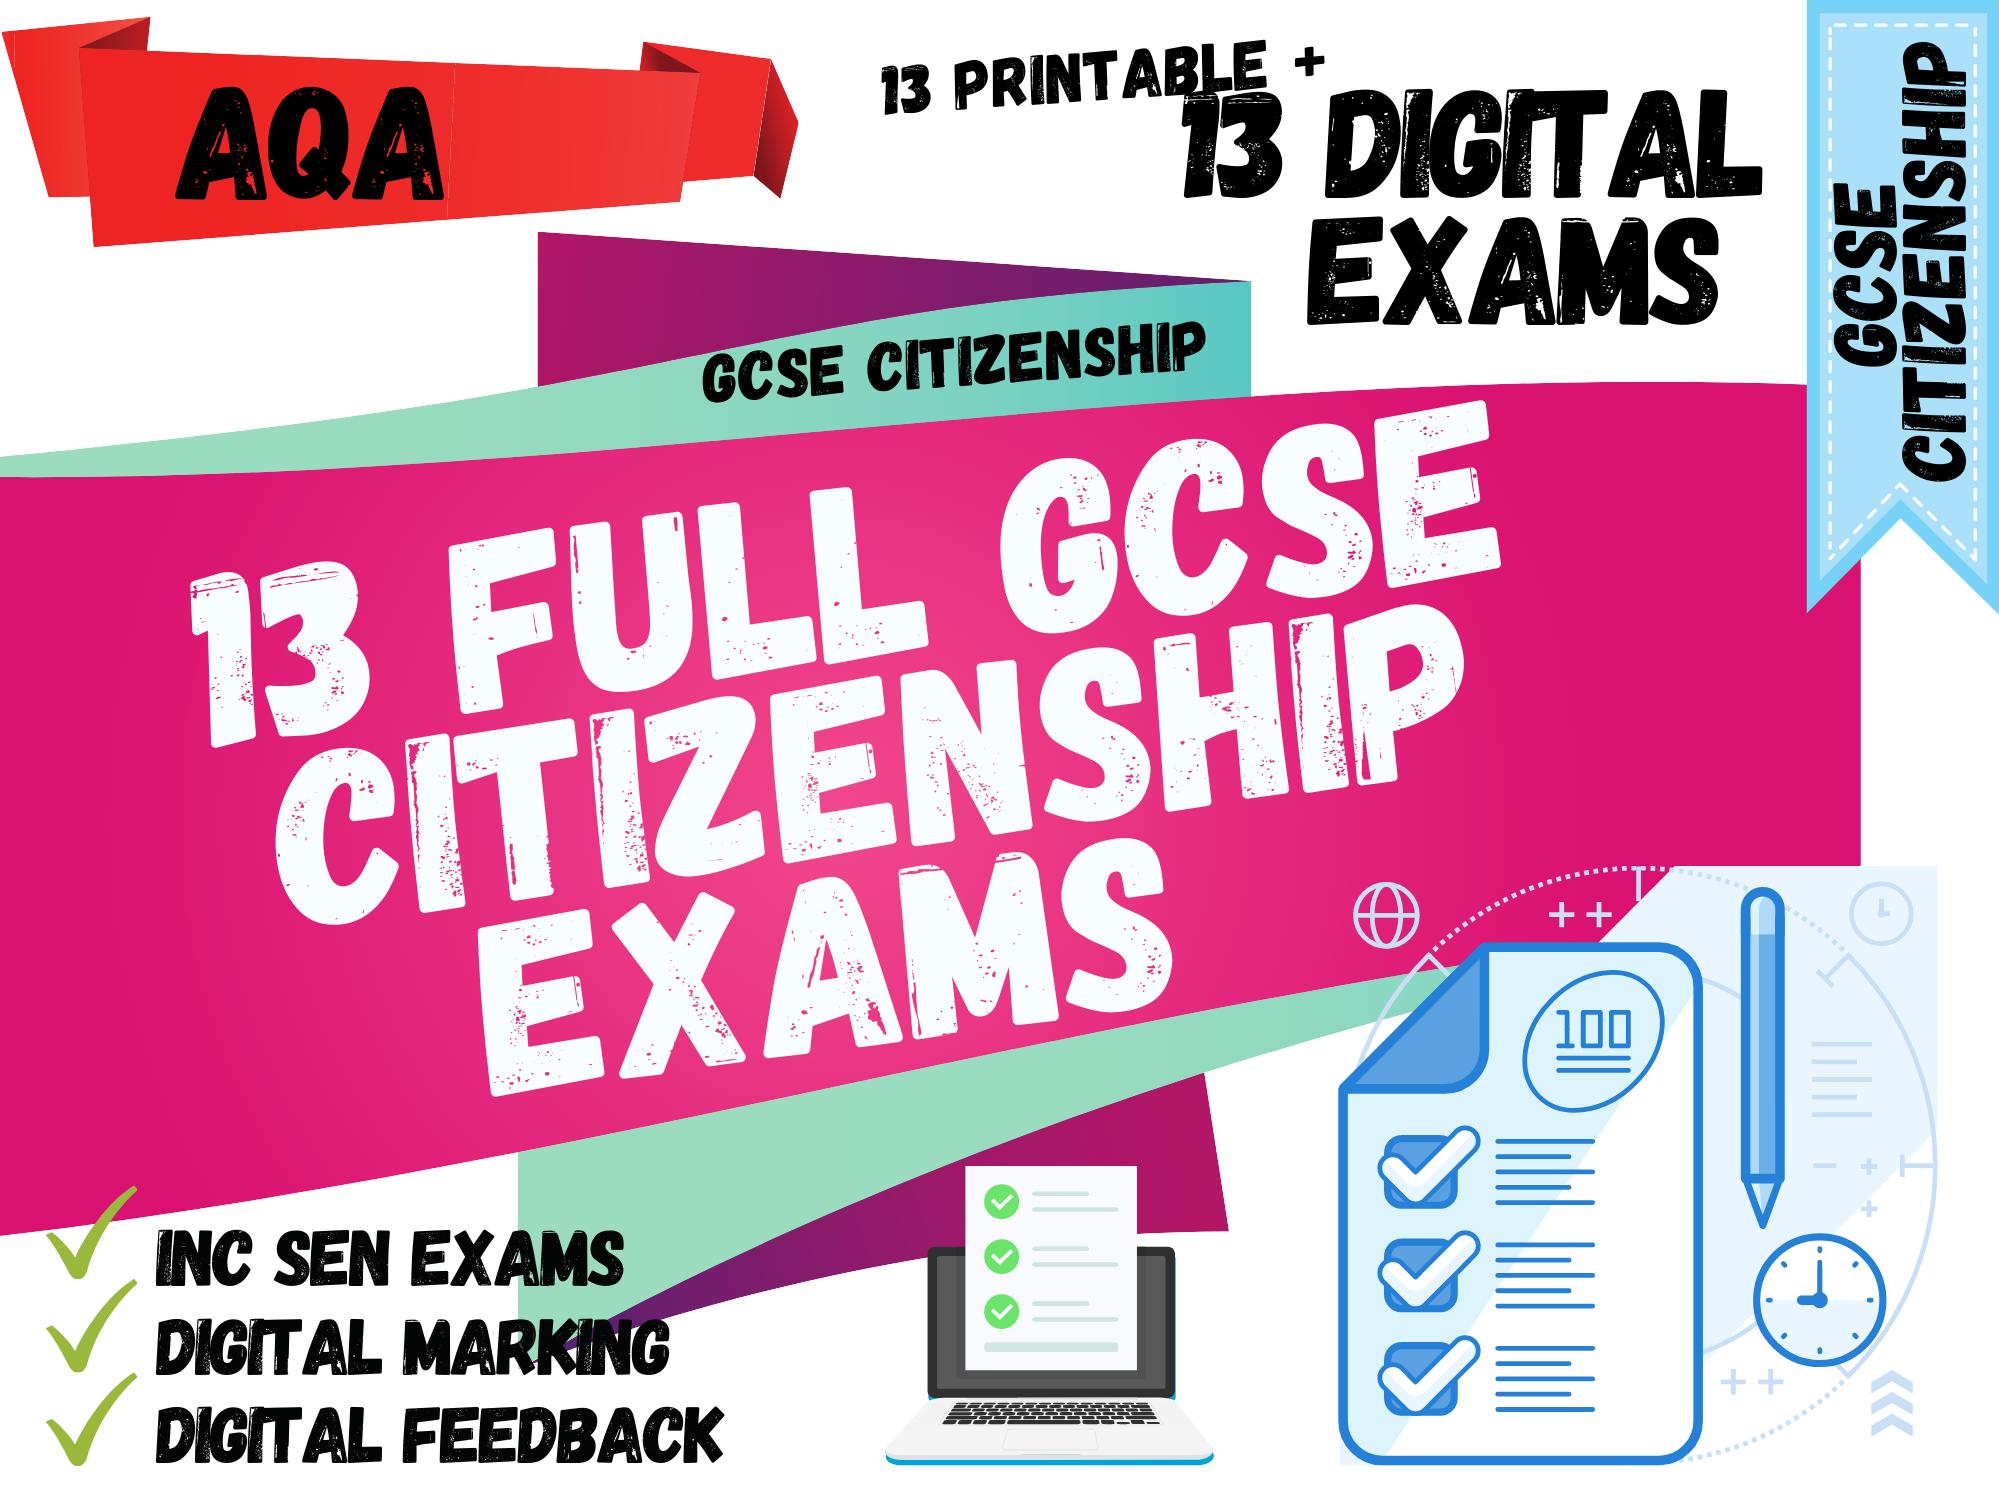 GCSE Citizenship AQA Exam Package